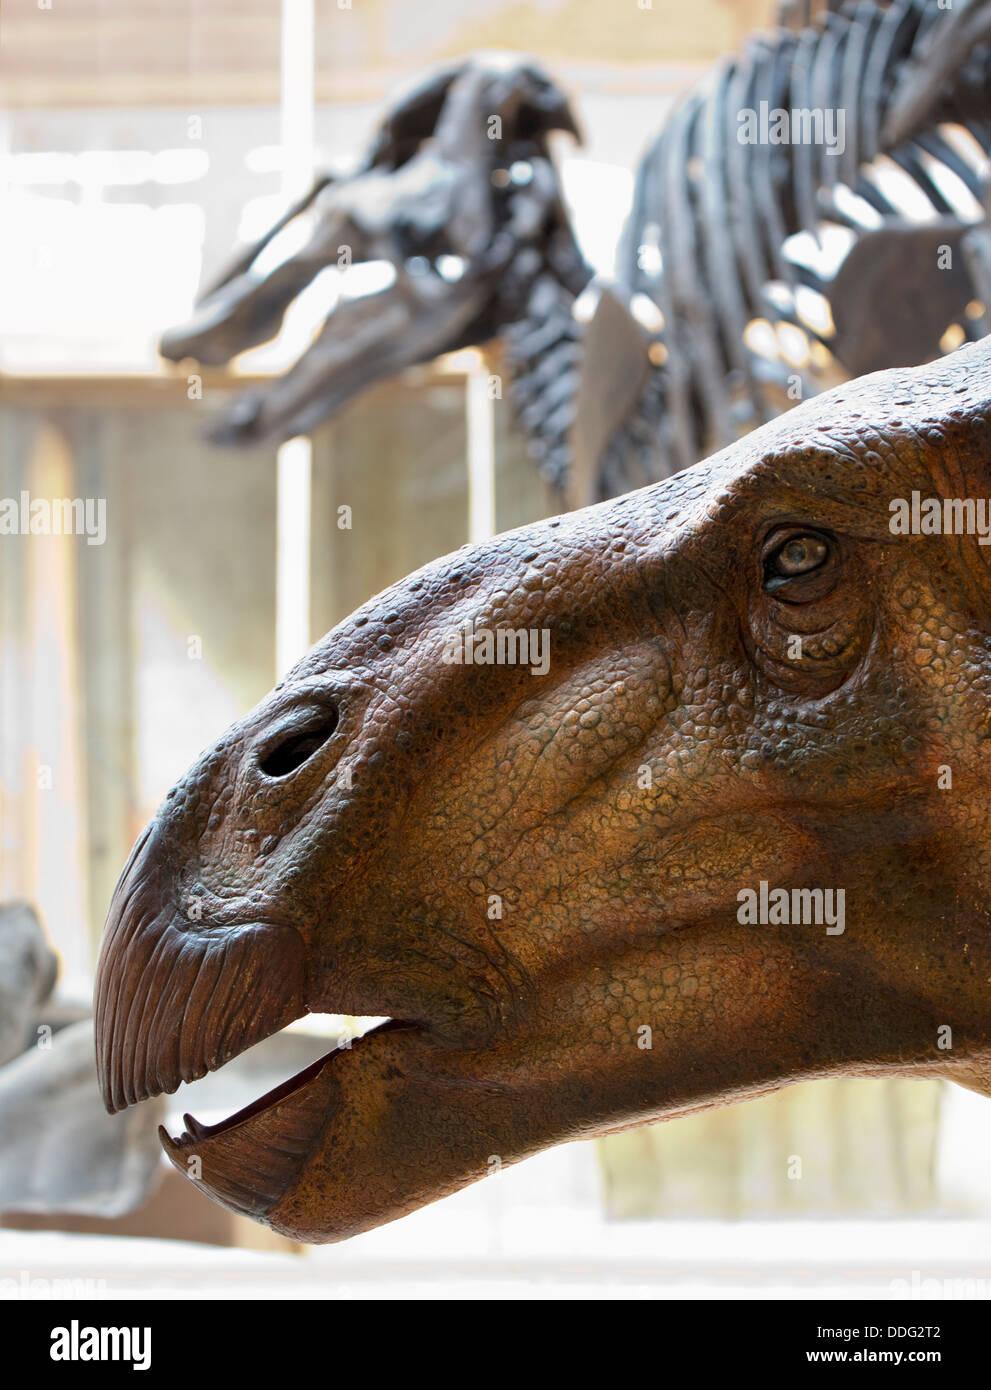 Dinosaur bones at the Pitt Rivers Natural History Museum, Oxford 2 - Stock Image